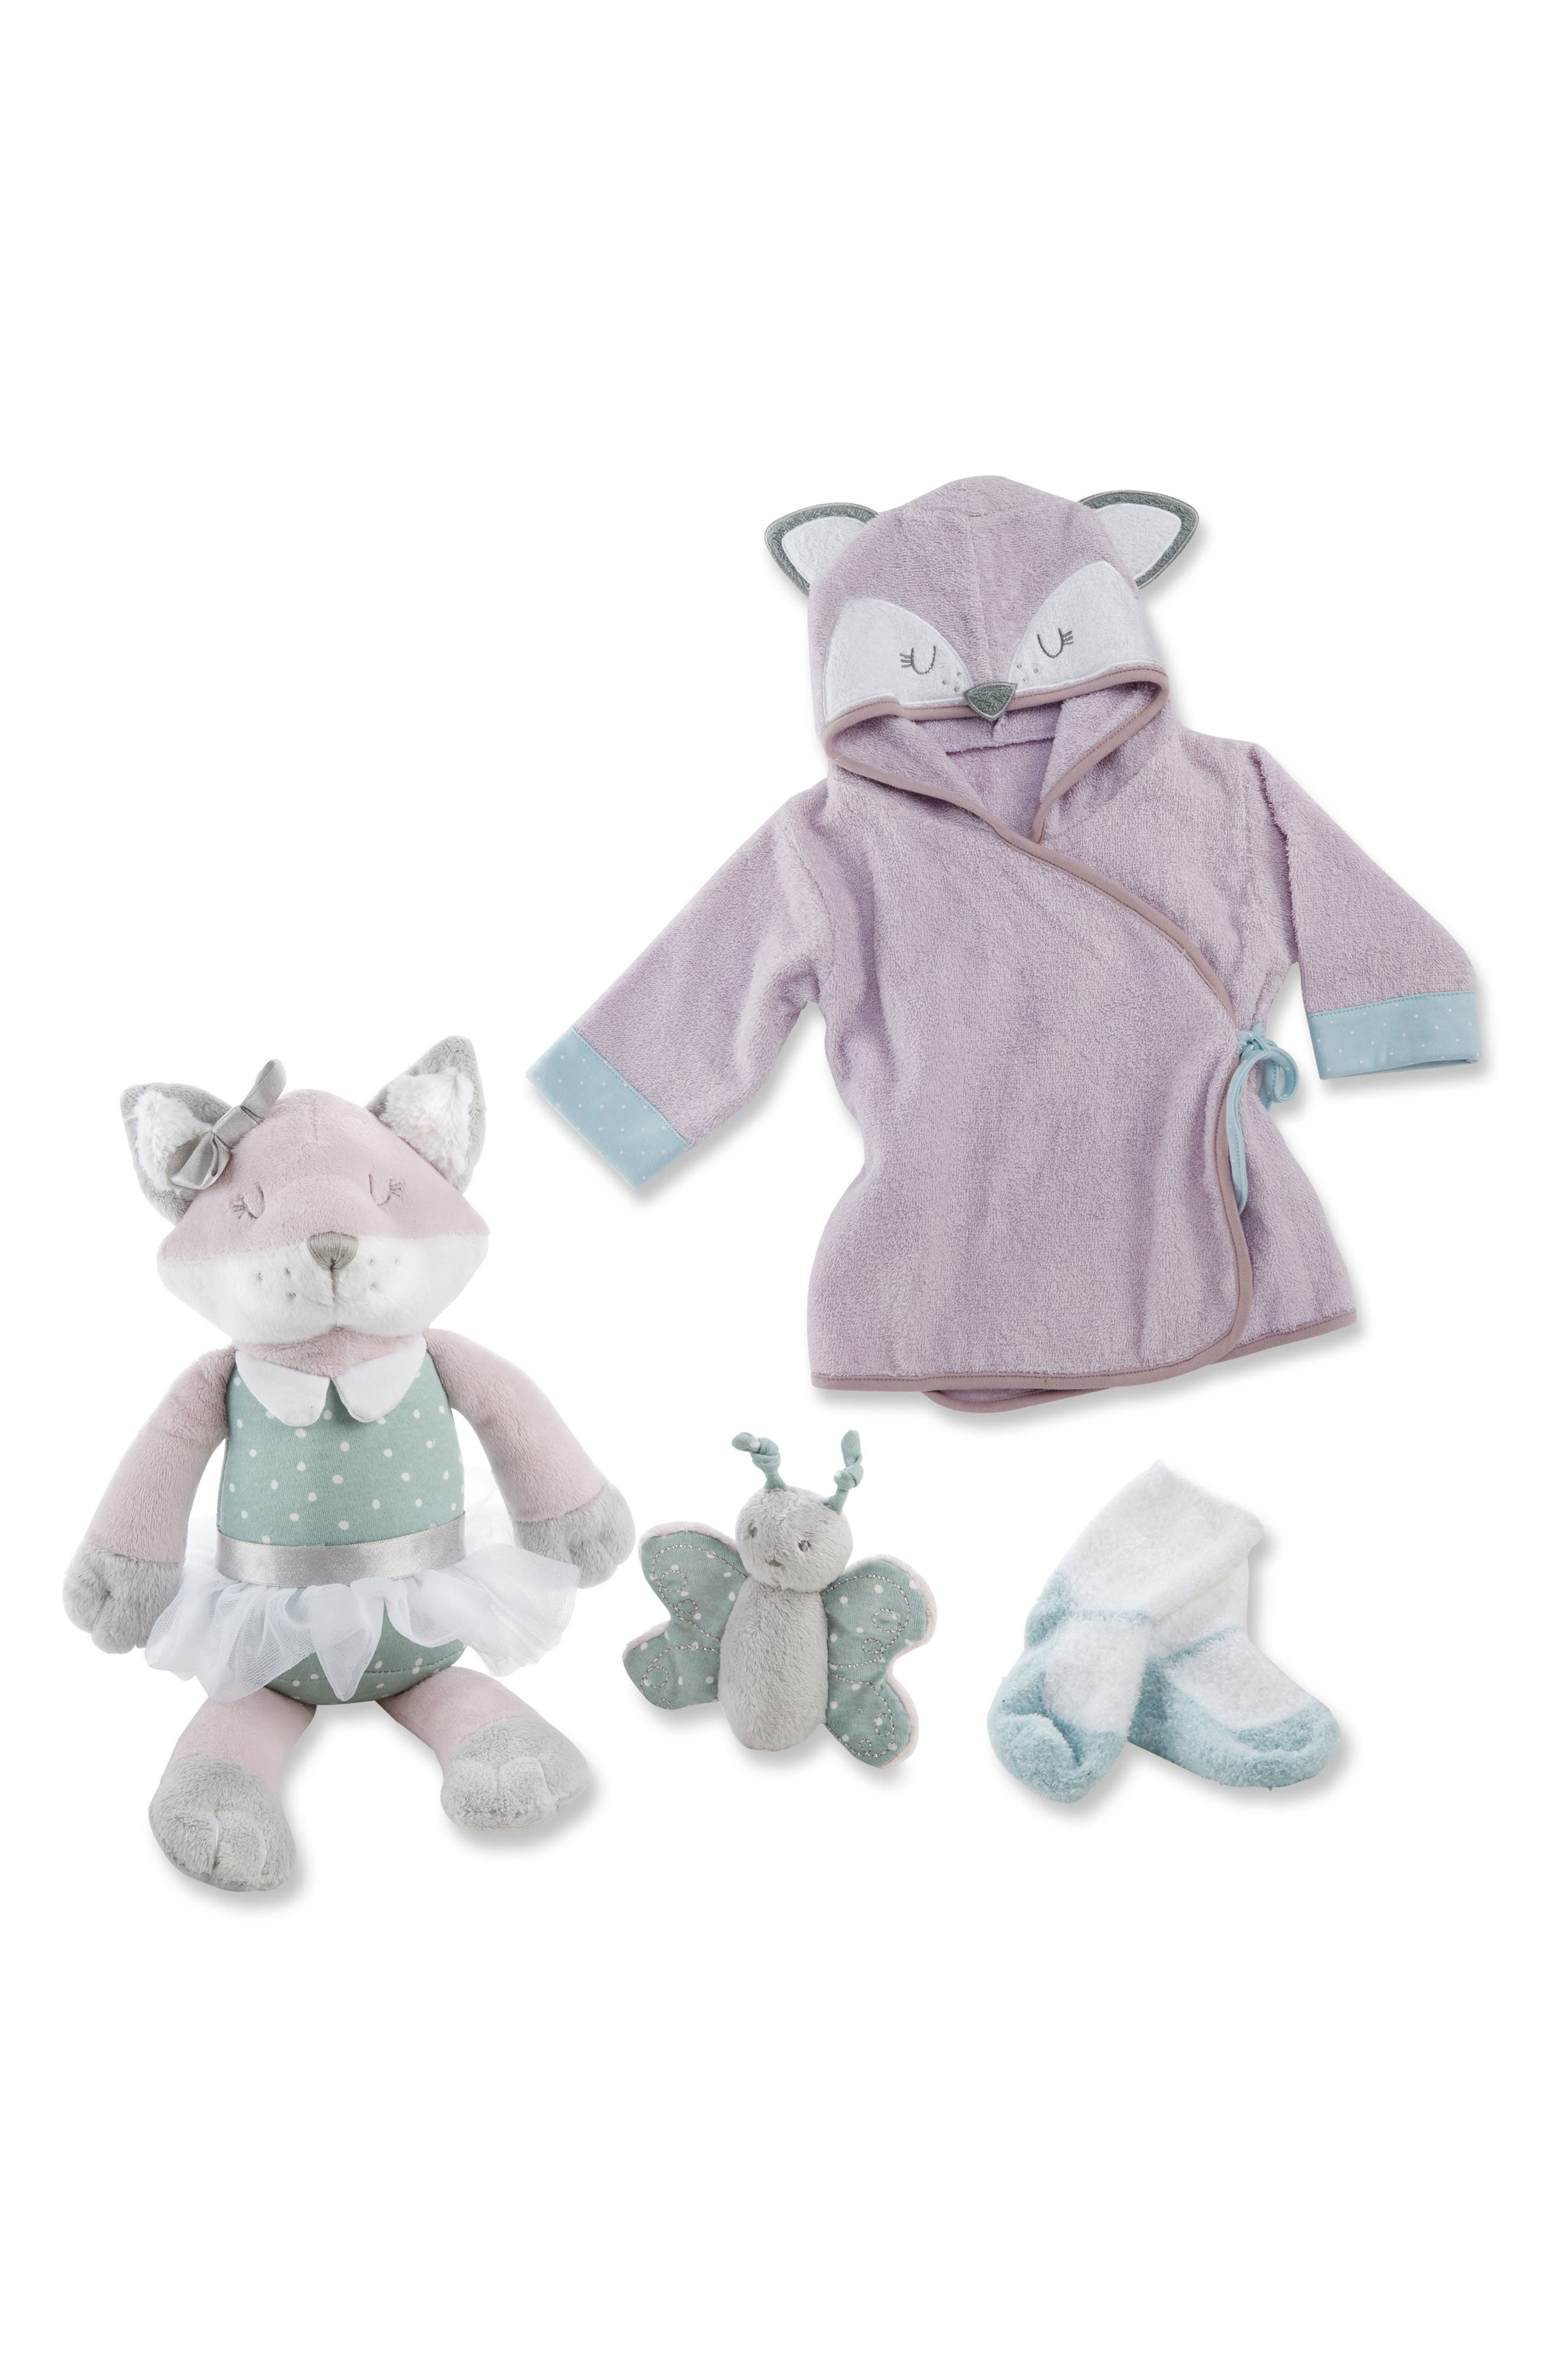 Forest Friends Fox Plush Robe, Fuzzy Socks, Stuffed Animal & Rattle Set,                             Main thumbnail 1, color,                             540